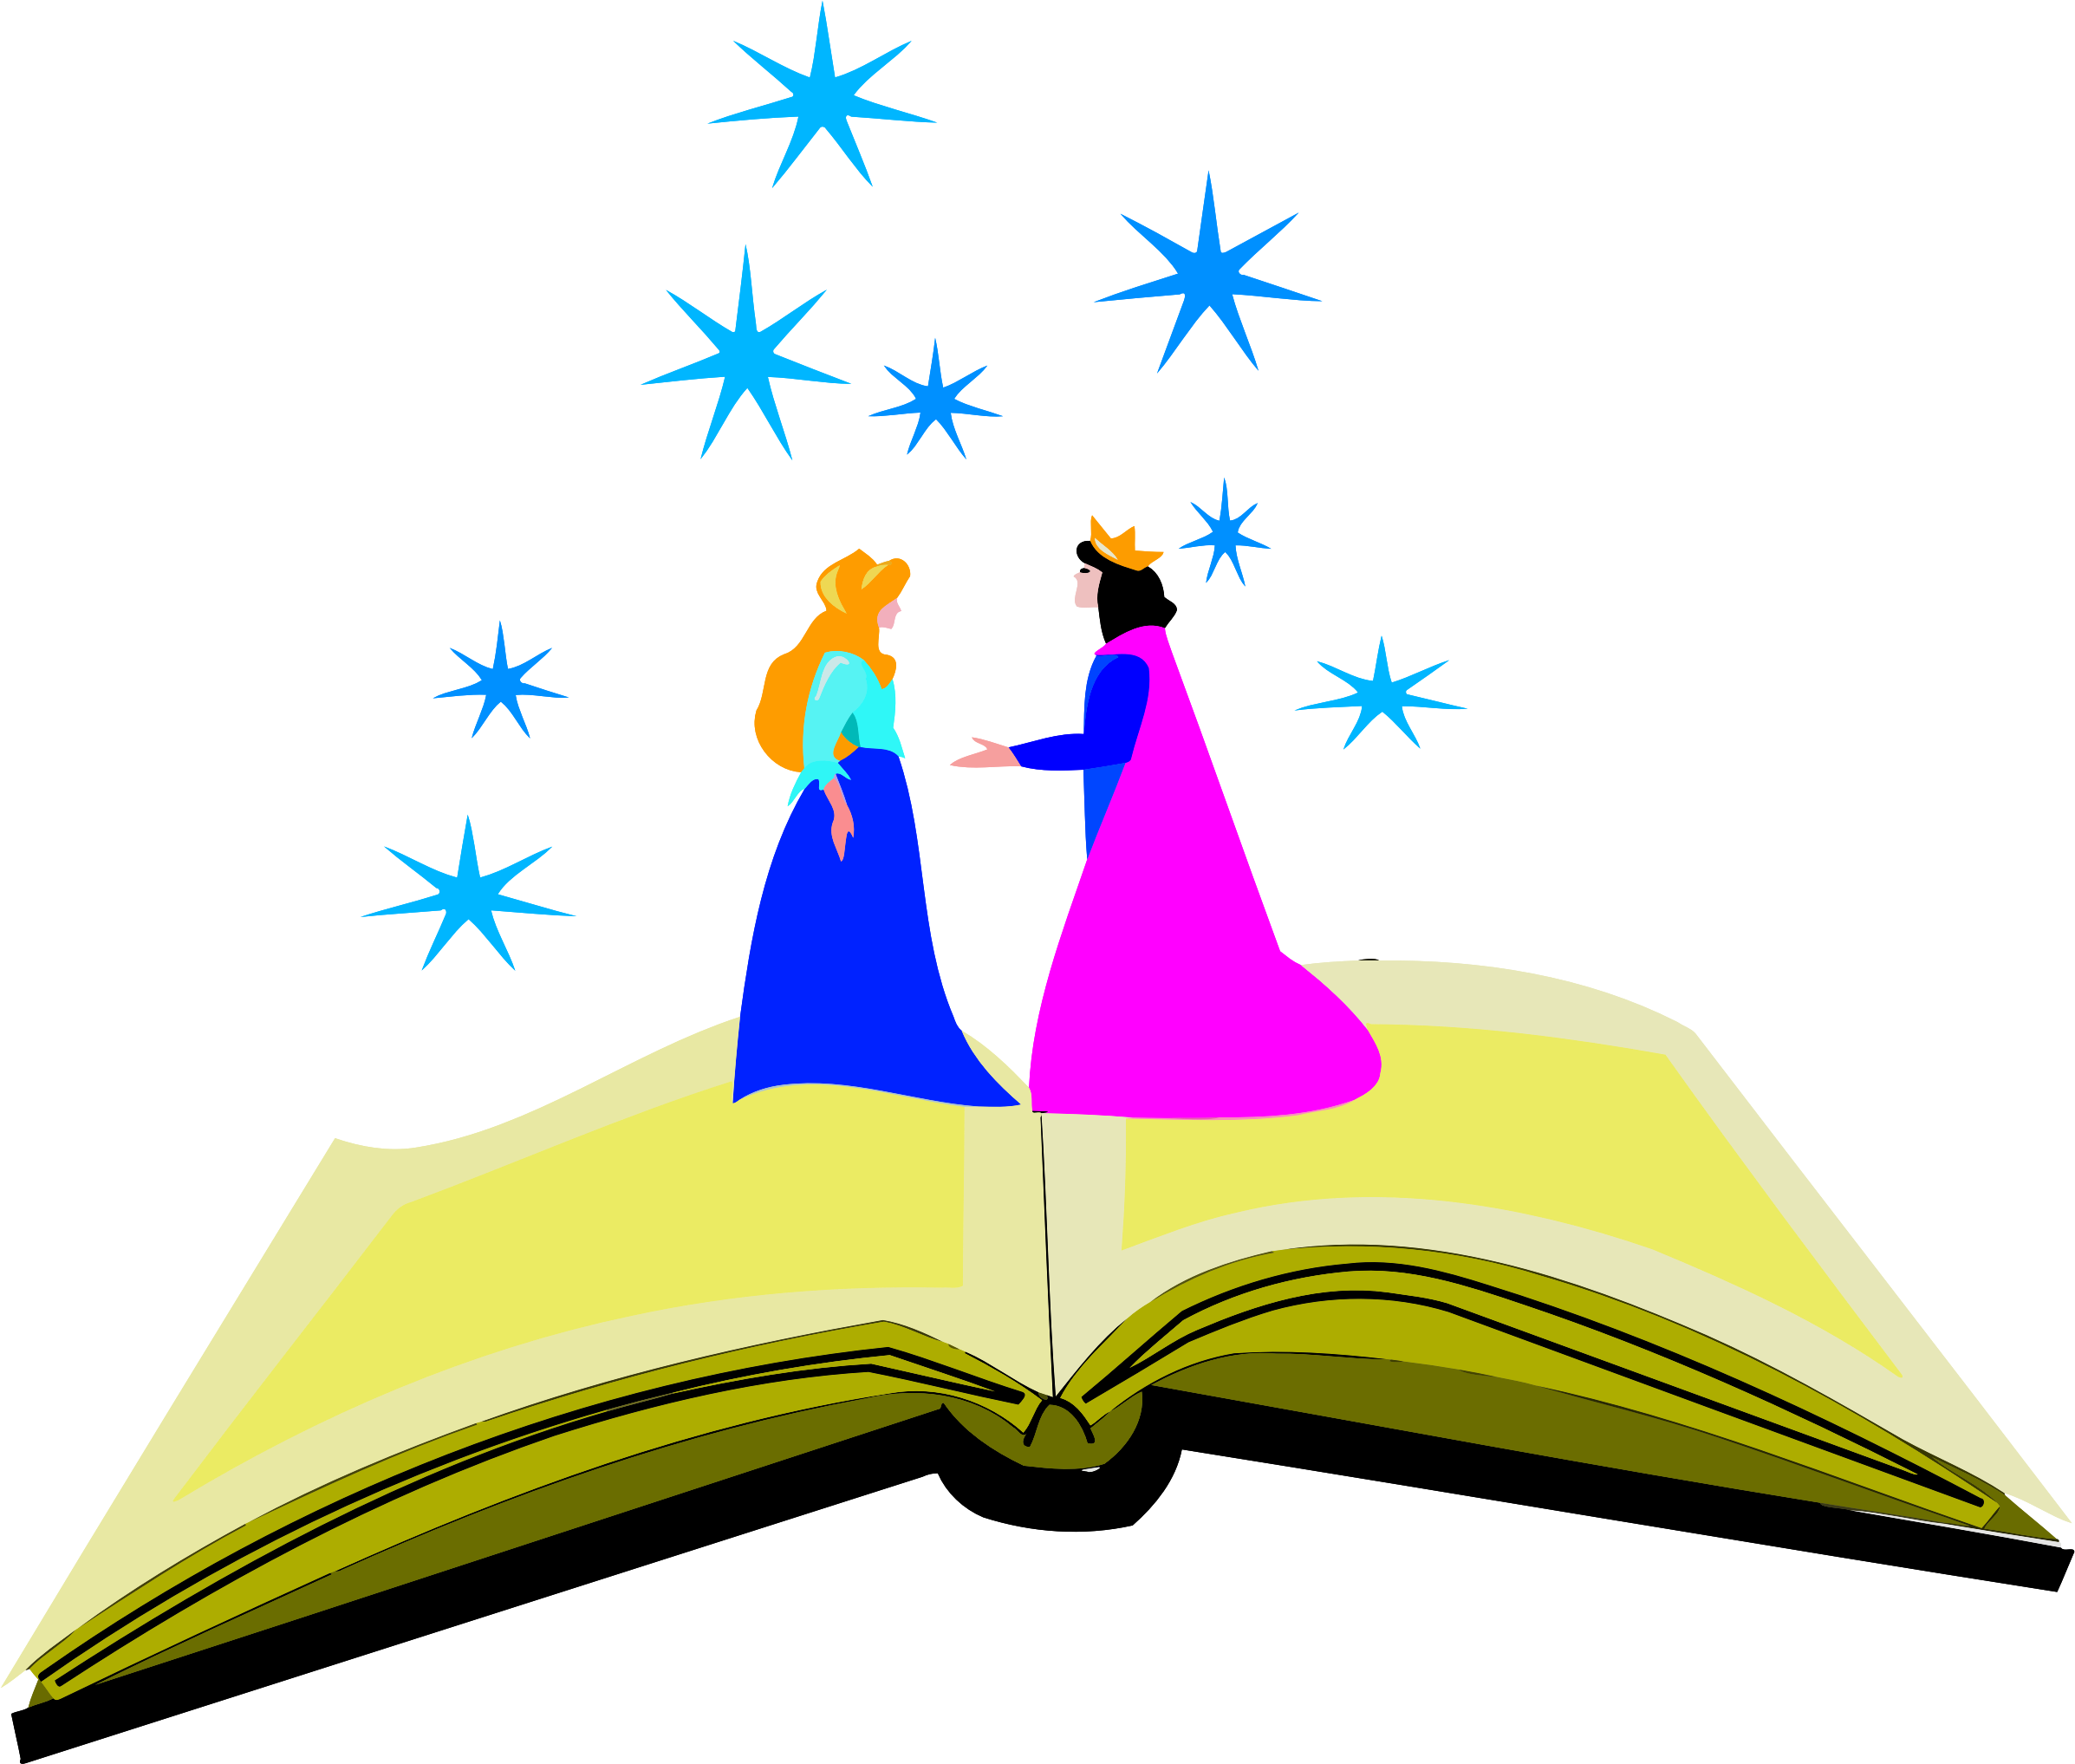 Royal storybook couple in fantasyland vector clipart image.